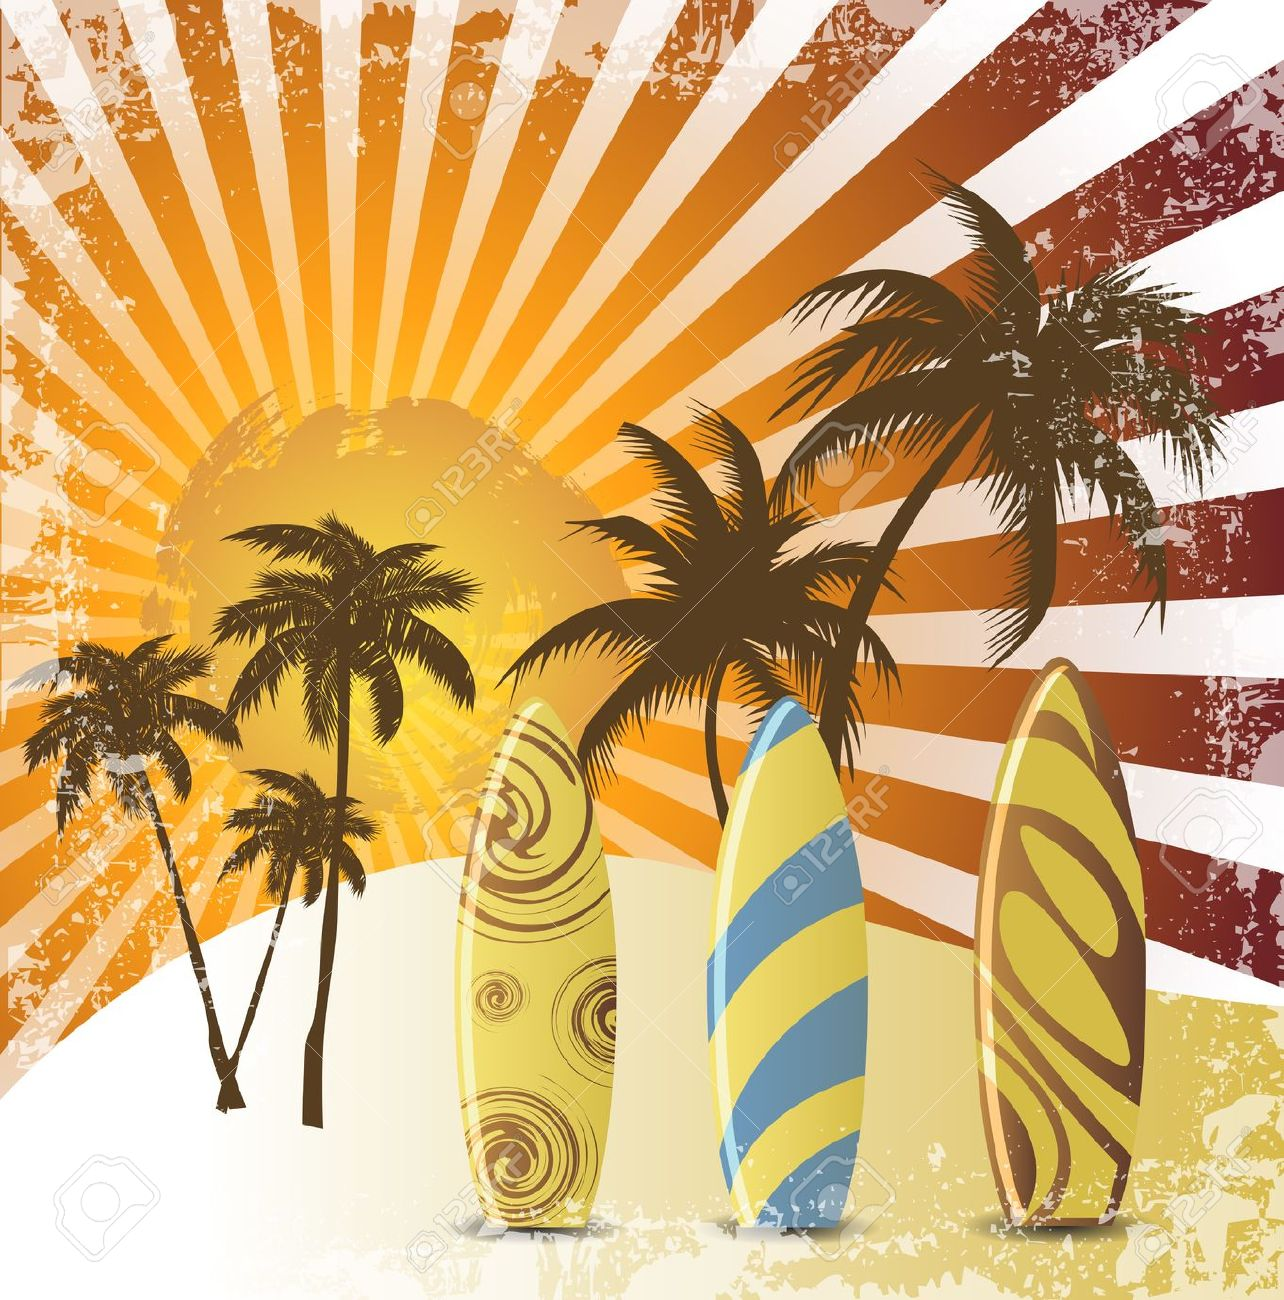 Vintage beach clipart vector transparent Free Vintage Beach Cliparts, Download Free Clip Art, Free ... vector transparent